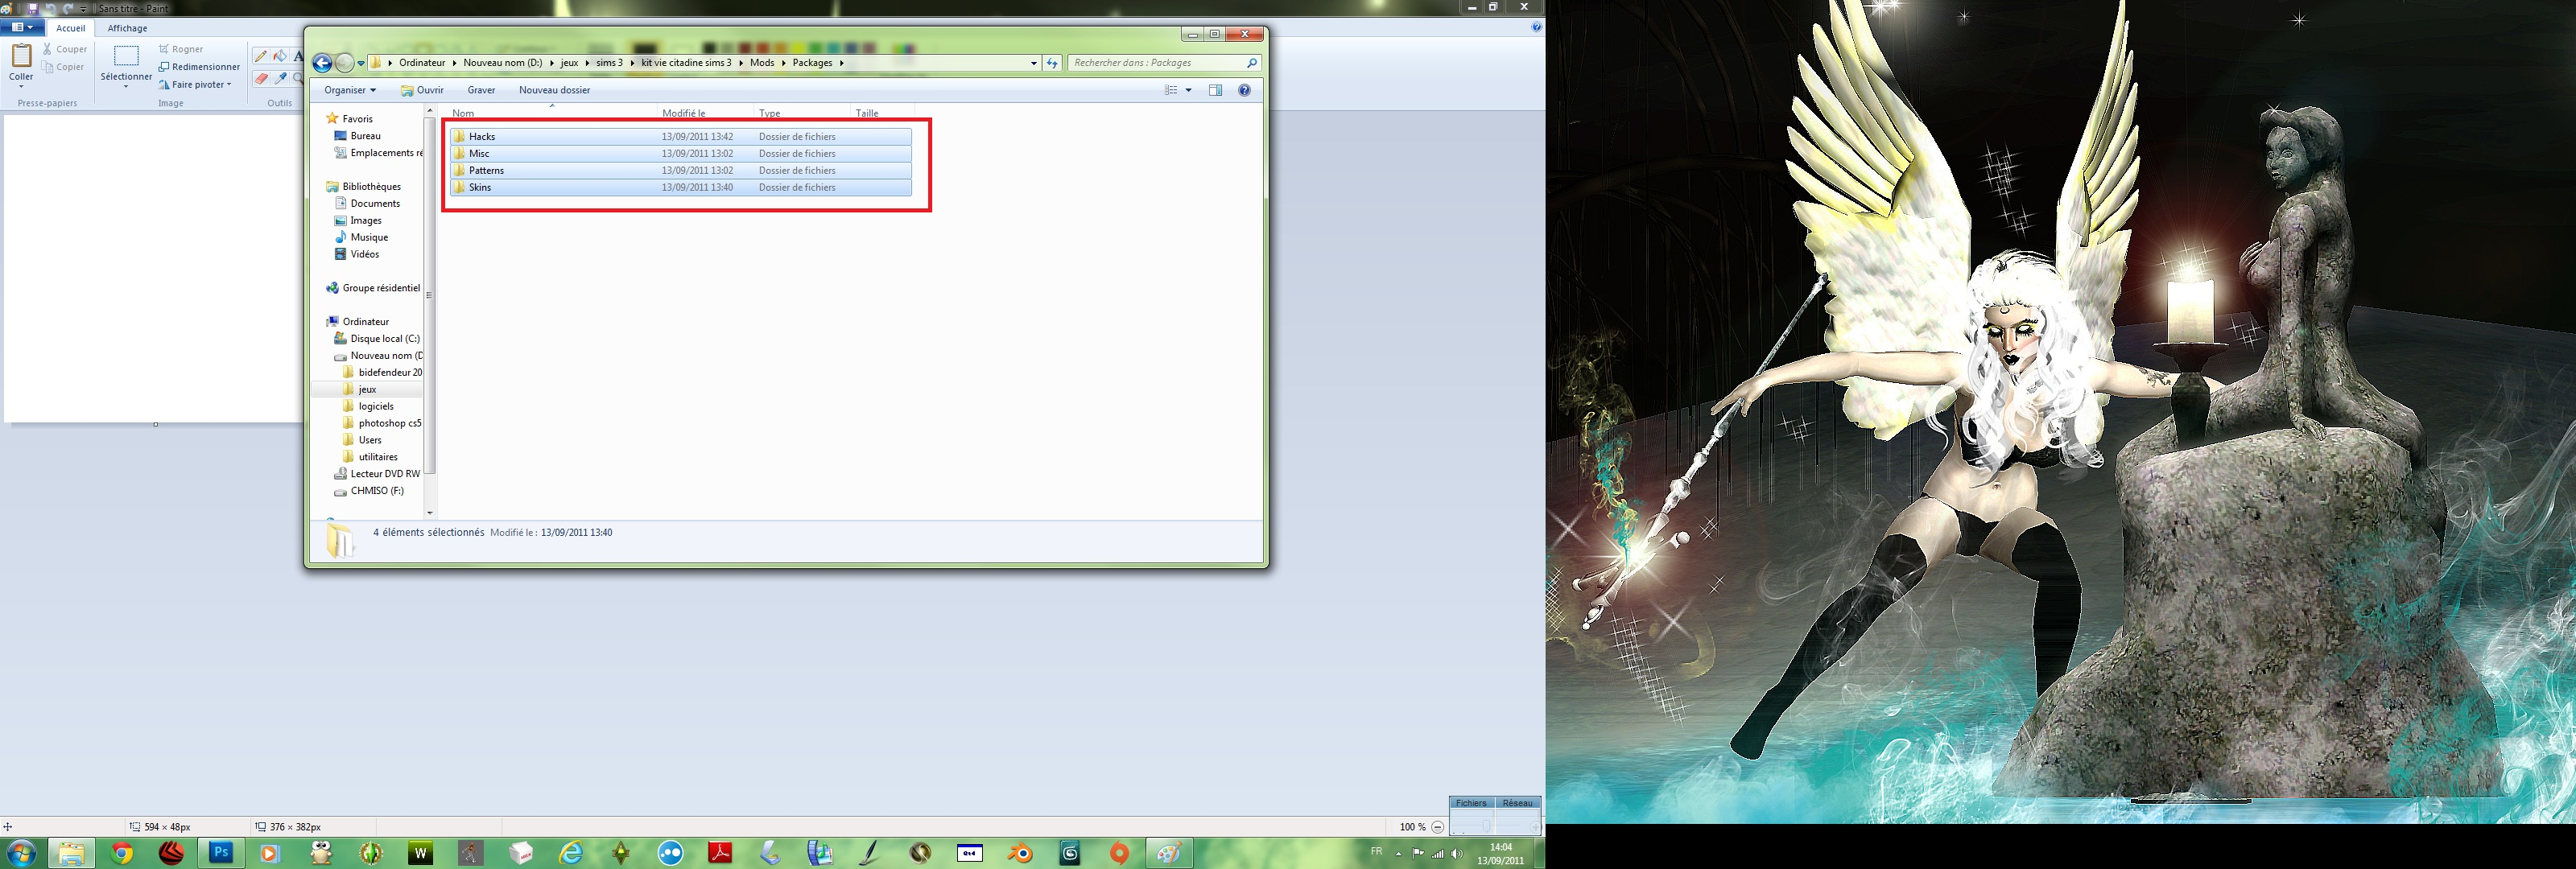 Le OMSP (One More Slot Package) ne fonctionne pas.  - Page 2 837109567